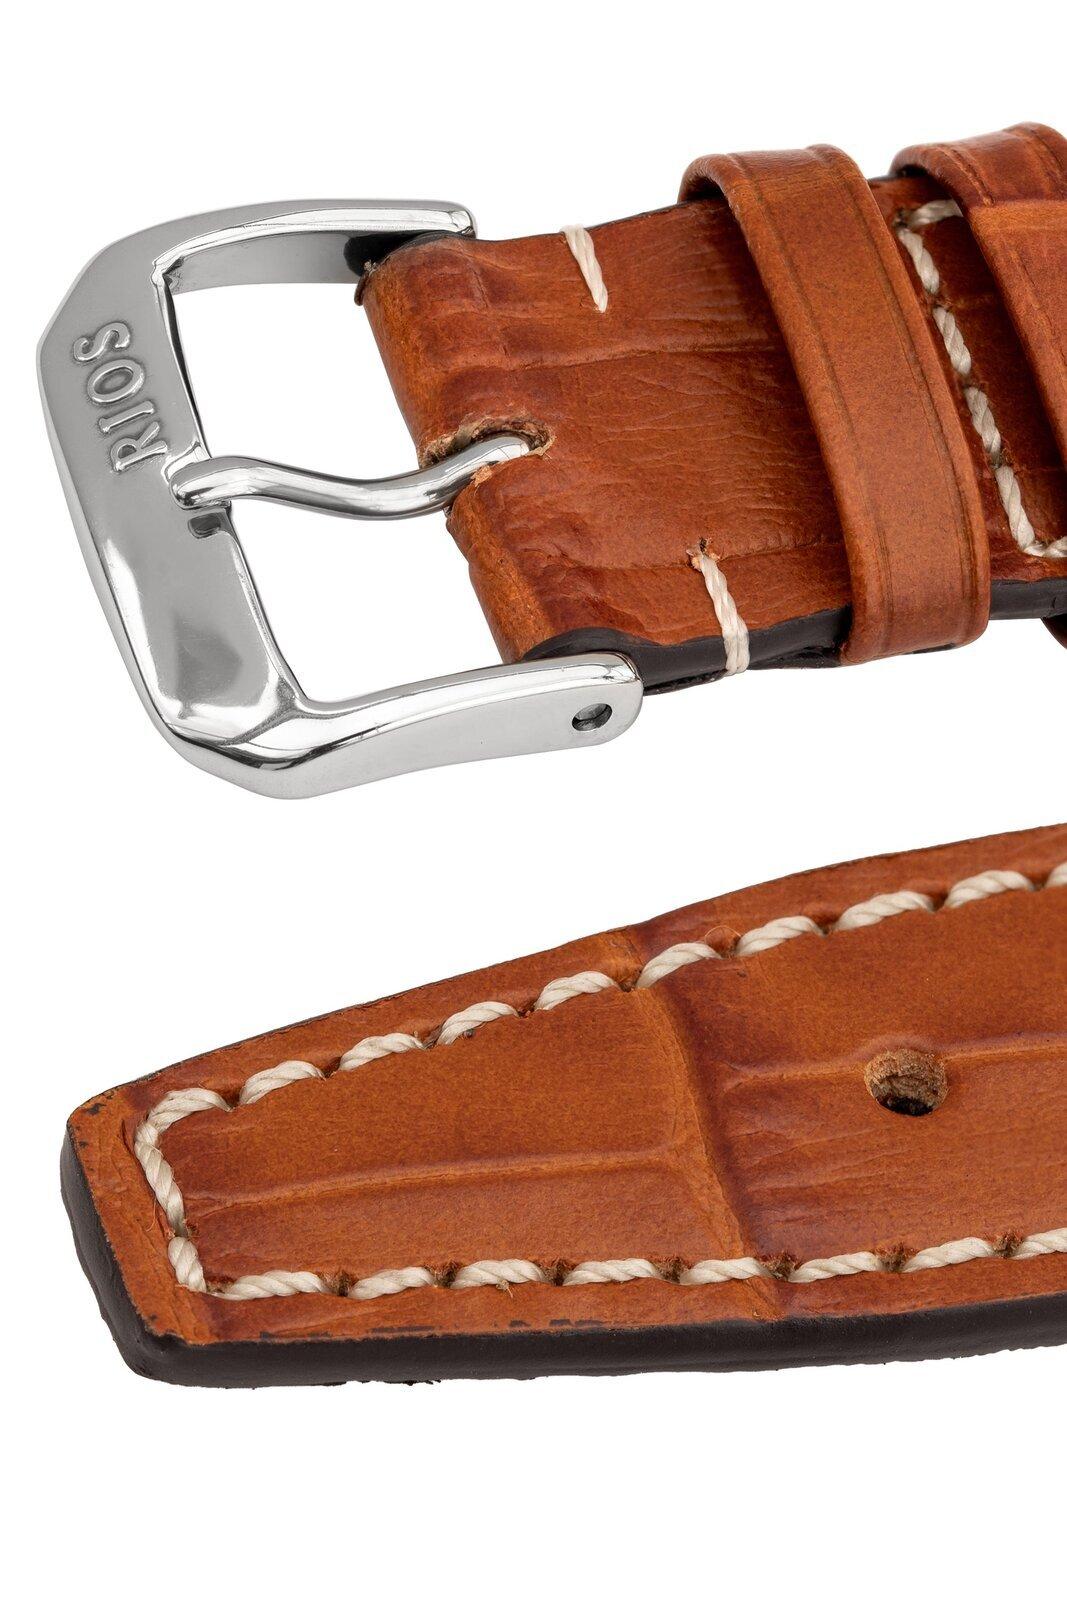 Rios1931 BOSTON Alligator-Embossed Leather Watch Strap in COGNAC